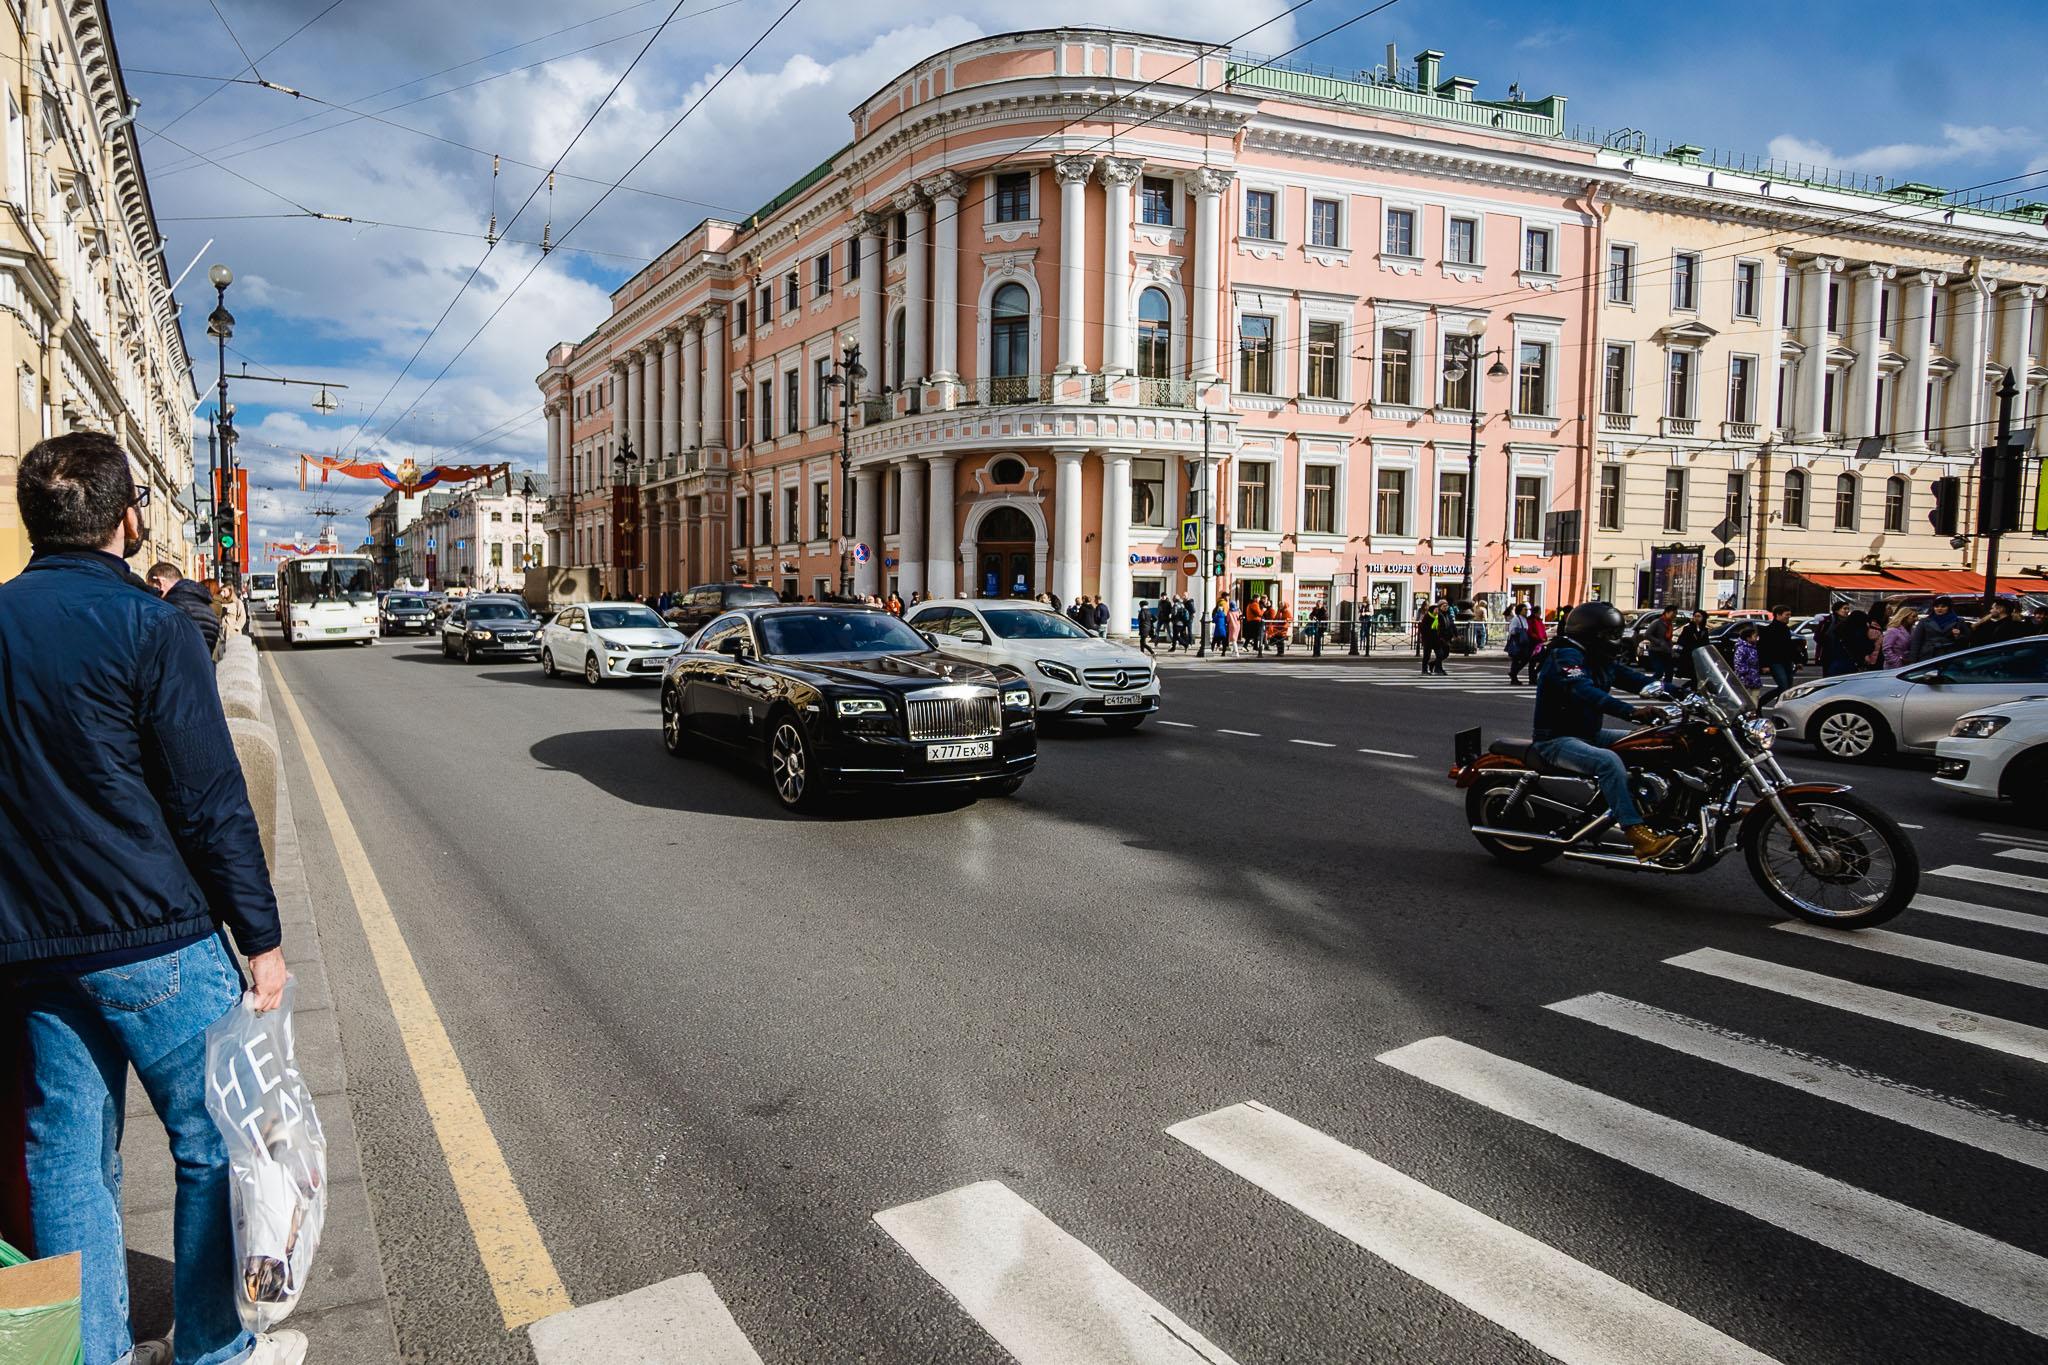 Luksus na ulicach Petersburga